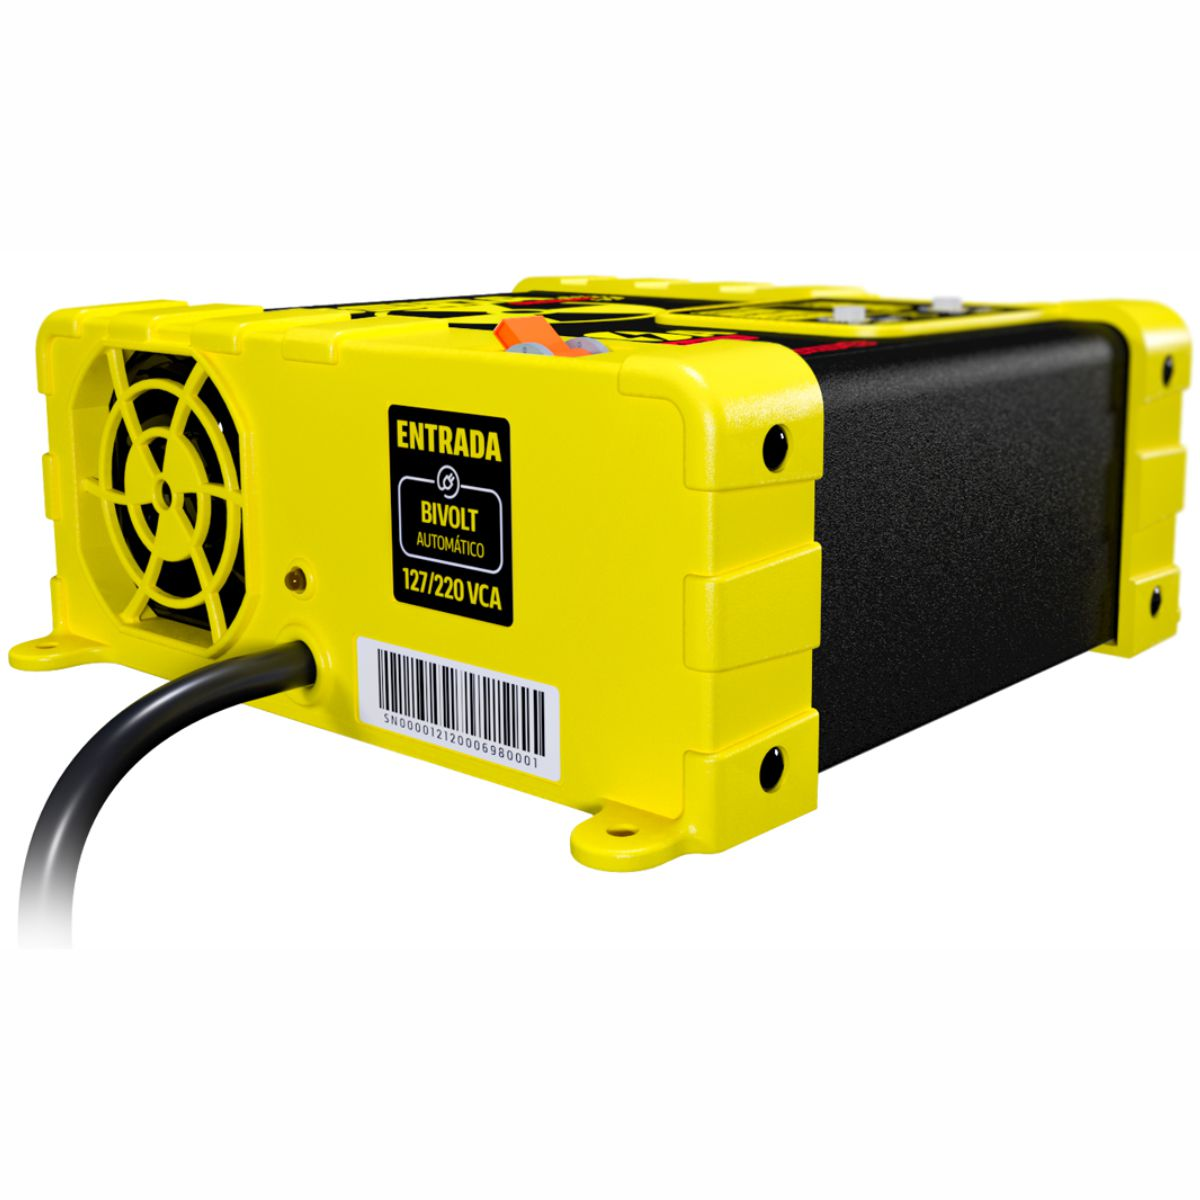 Fonte e Carregador Usina 50A Smart 12 Volts com Voltímetro e Amperímetro Bivolt